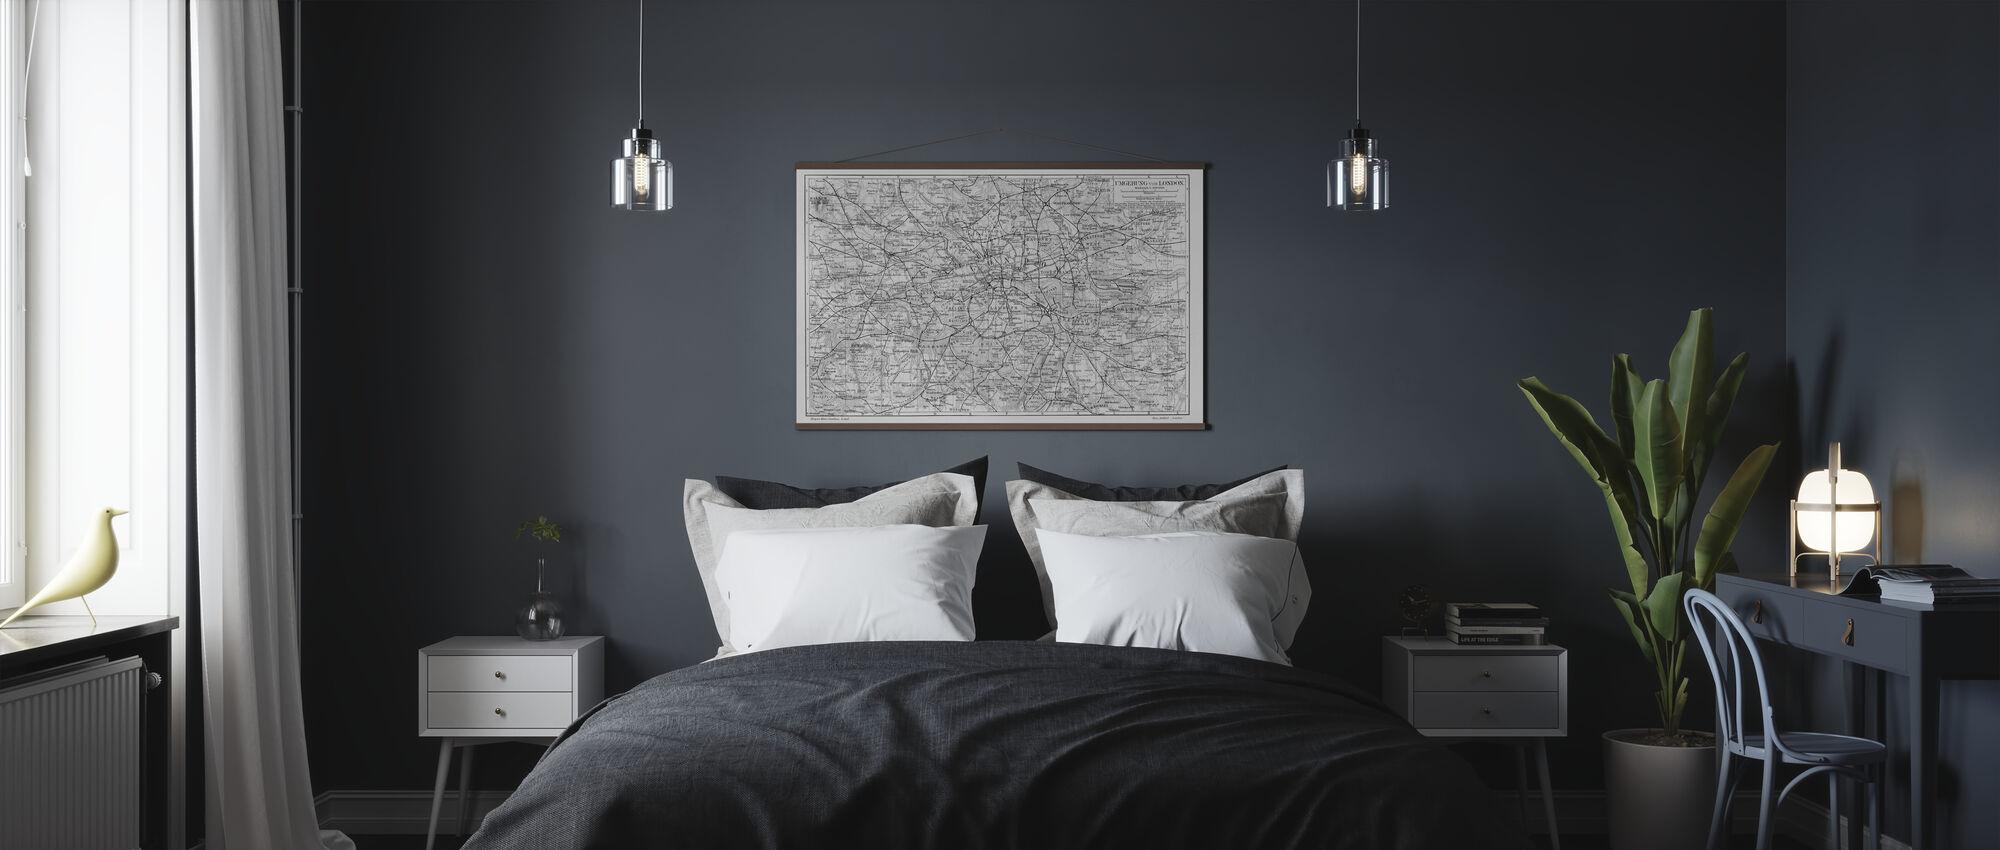 London Karte Grau - Poster - Schlafzimmer